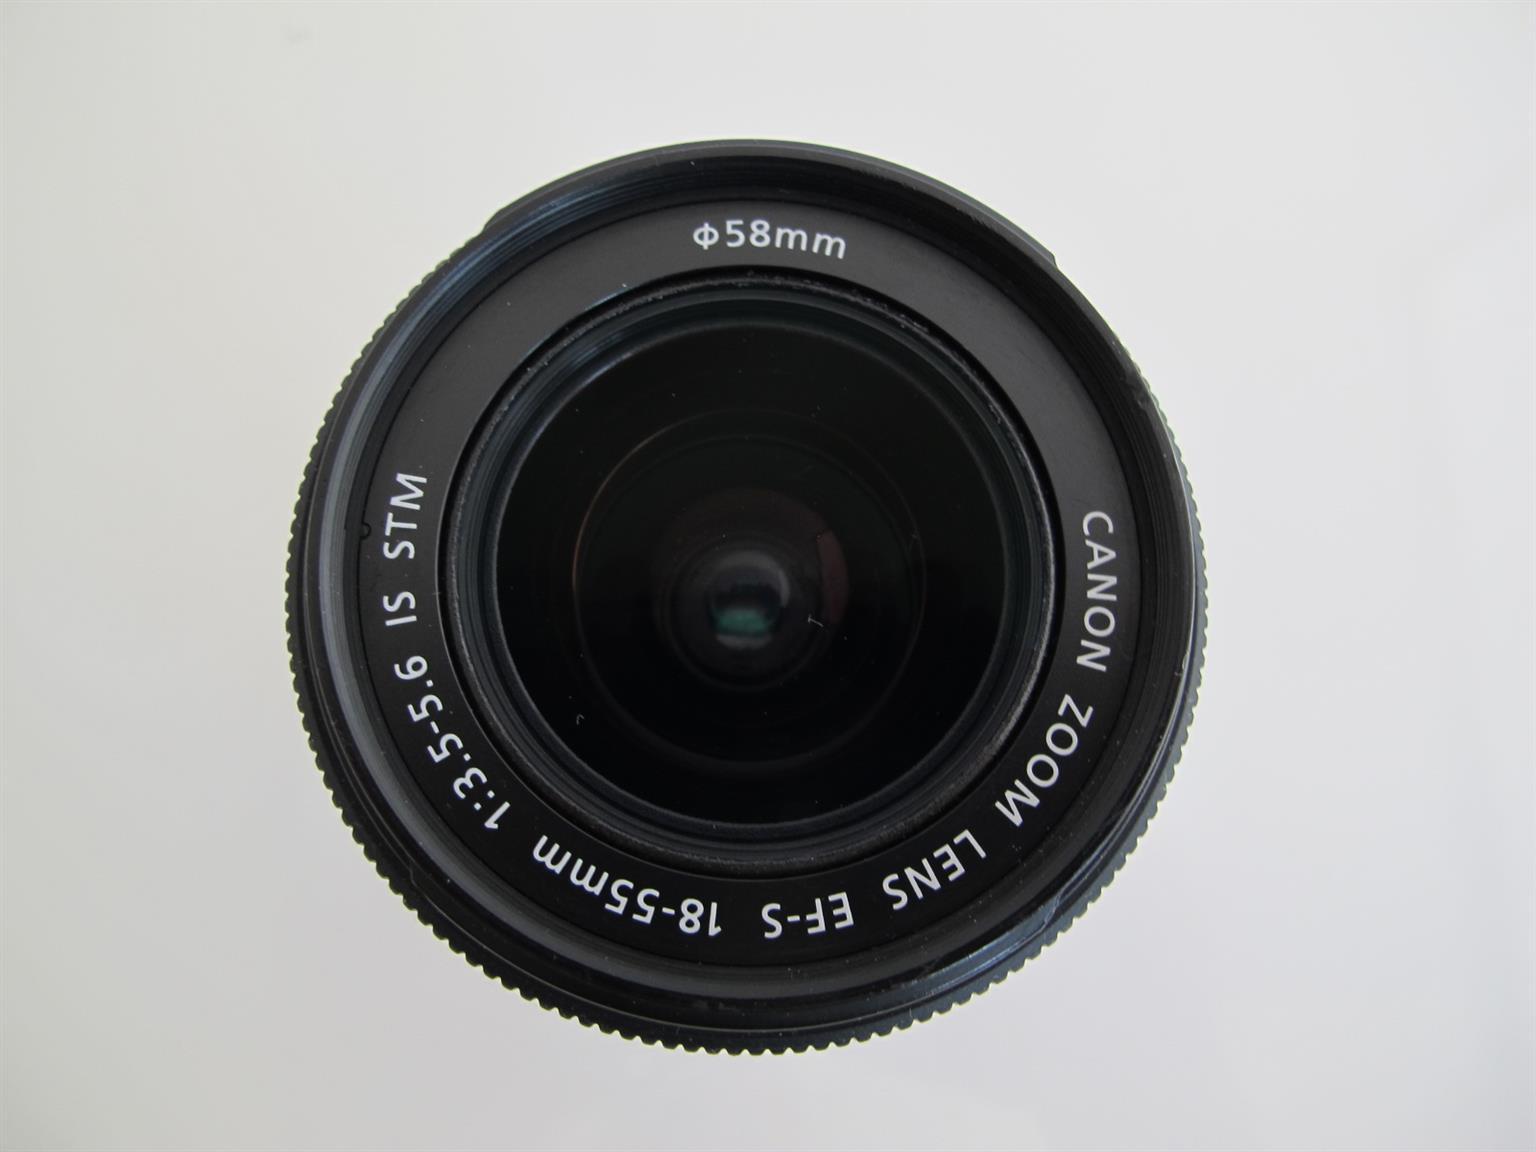 Canon EF-S 18-55 mm f 4 -5.6 IS STM Lens